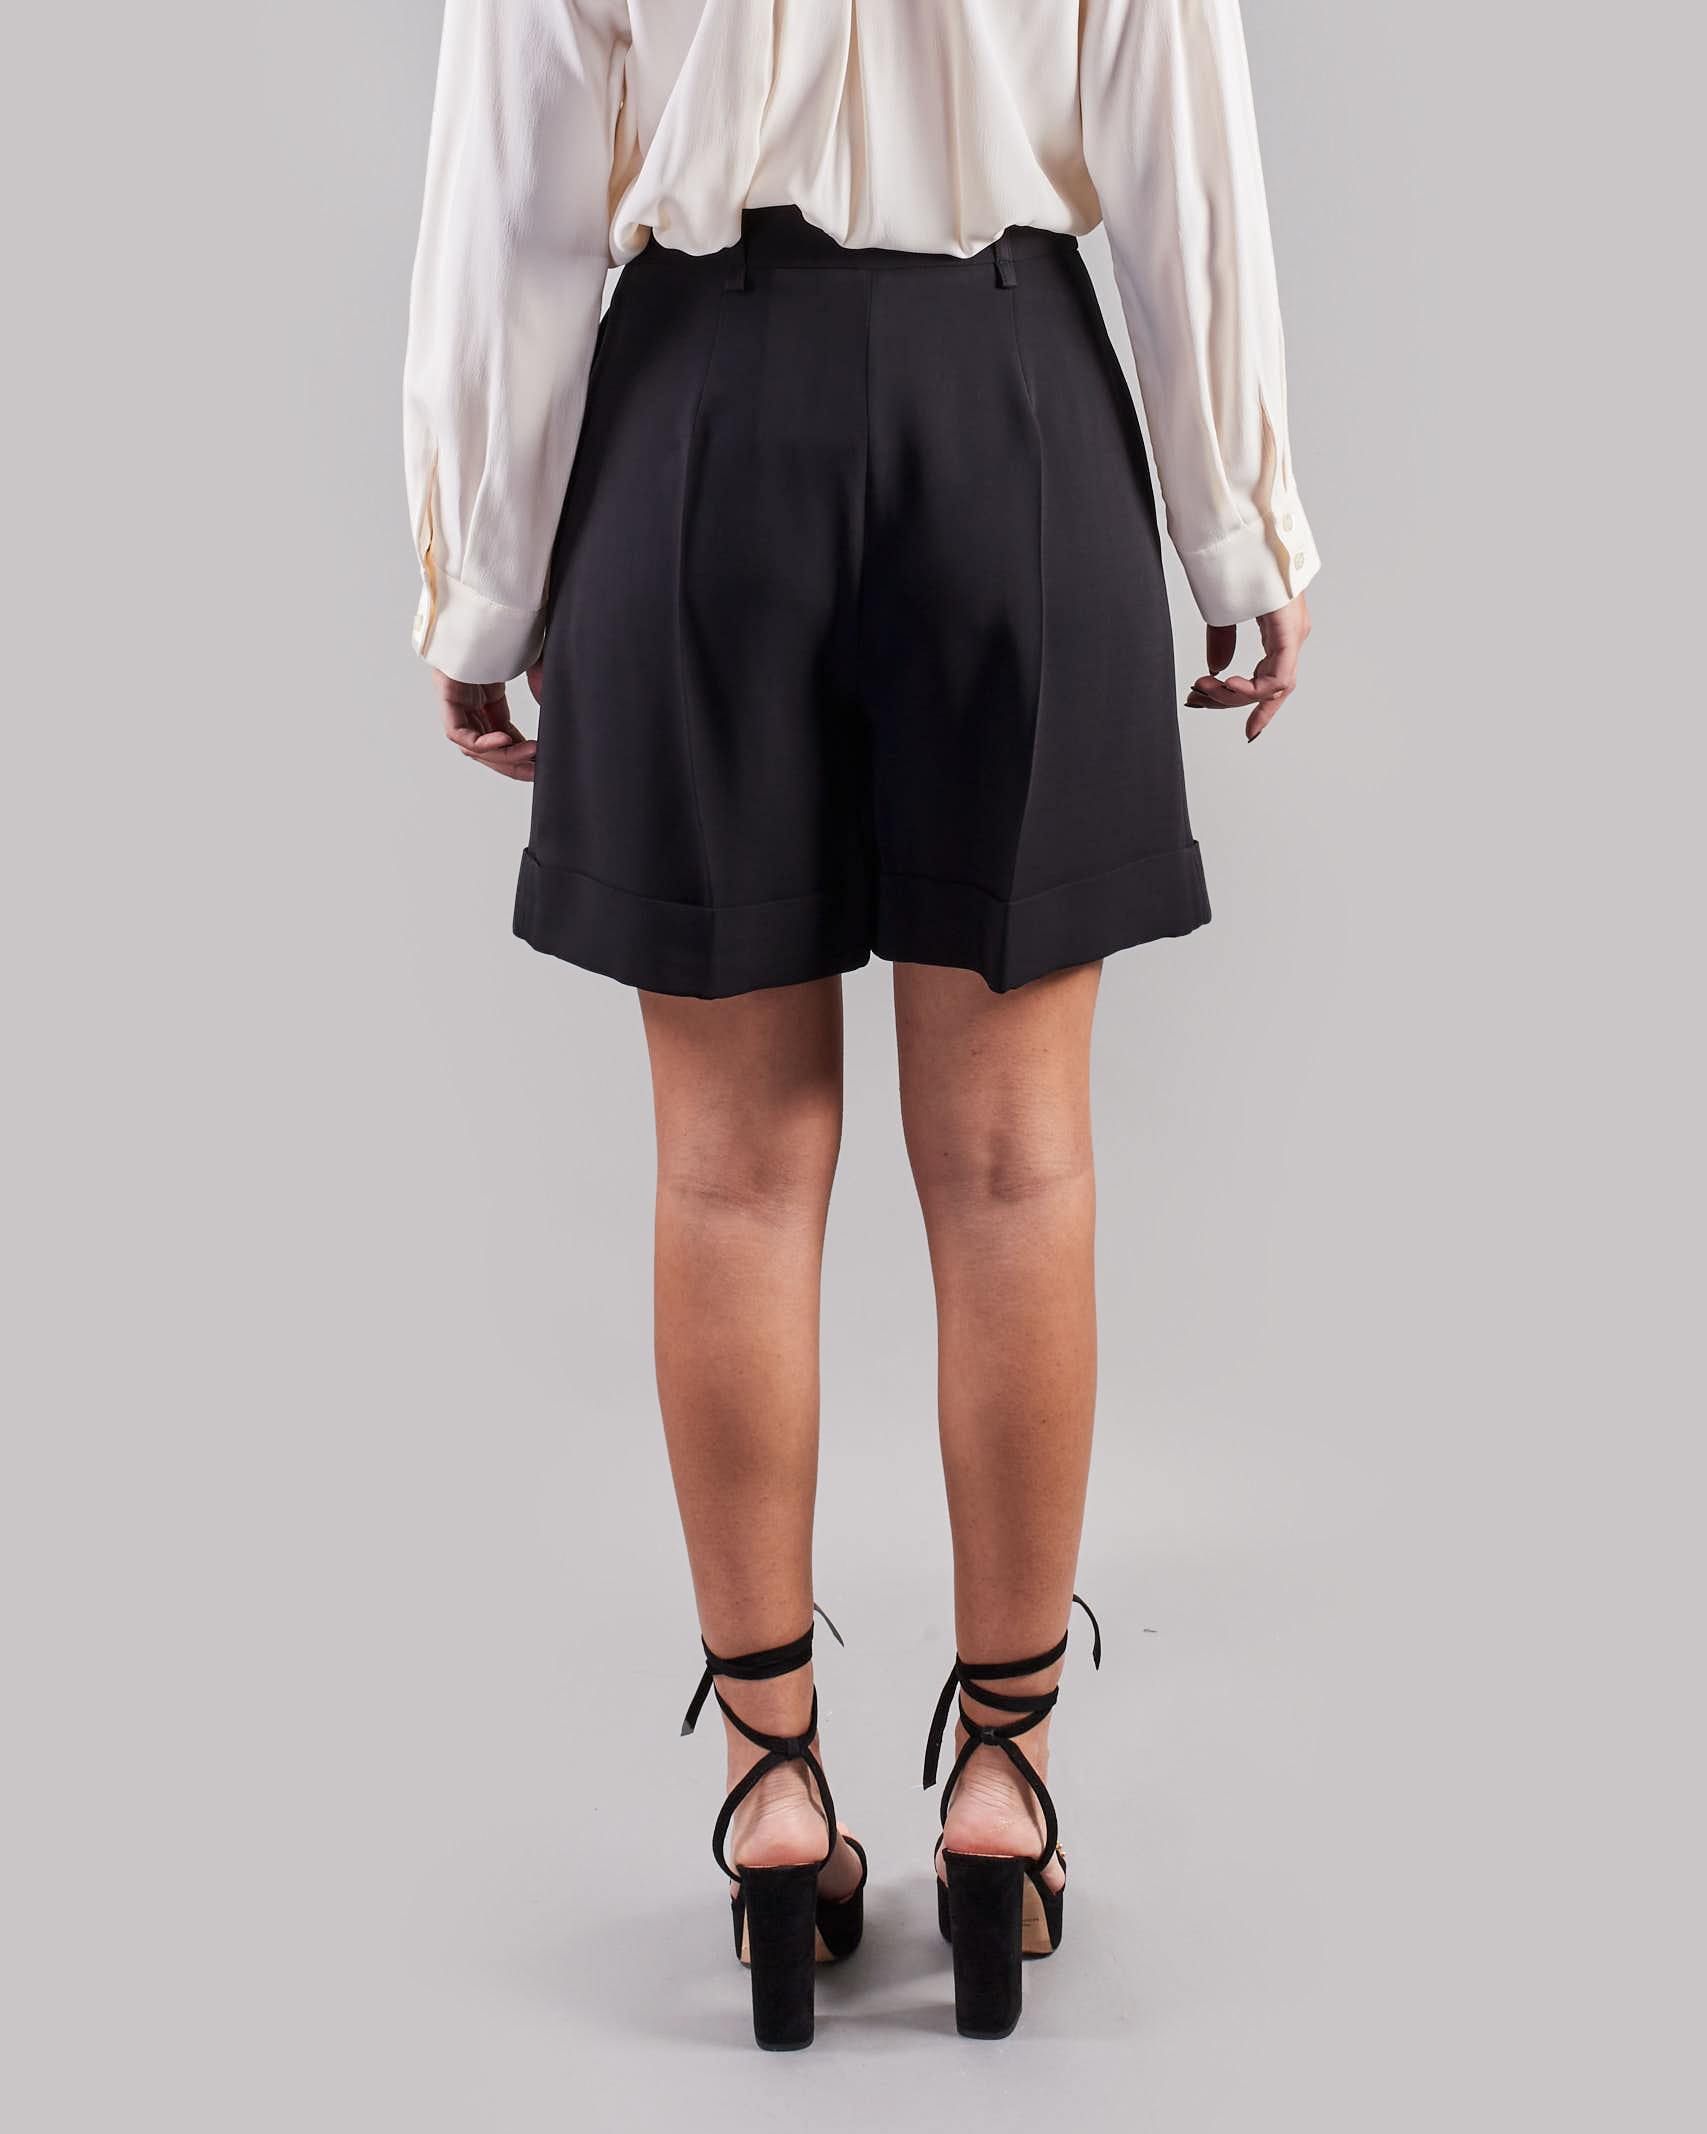 Shorts con pences Simona Corsellini SIMONA CORSELLINI   Shorts   SH00101TCAD00013